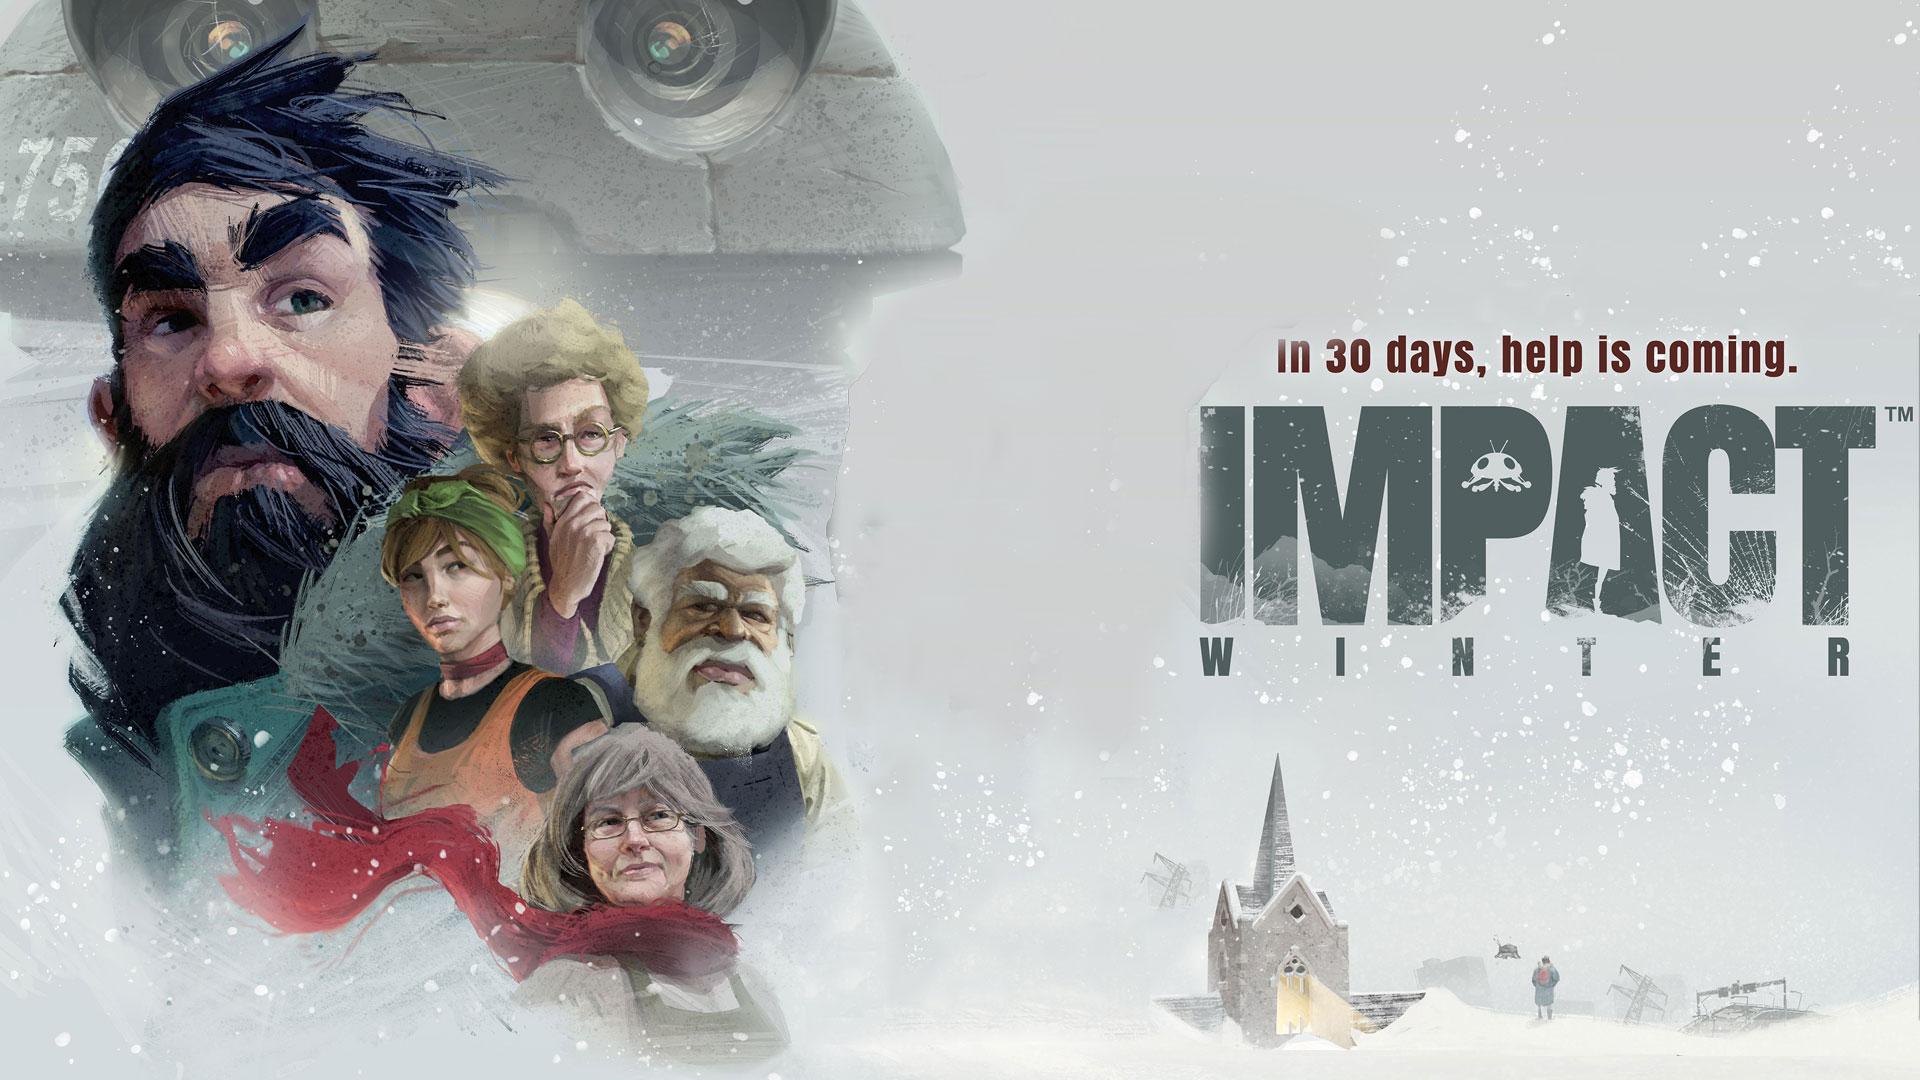 Free Impact Winter Wallpaper in 1920x1080